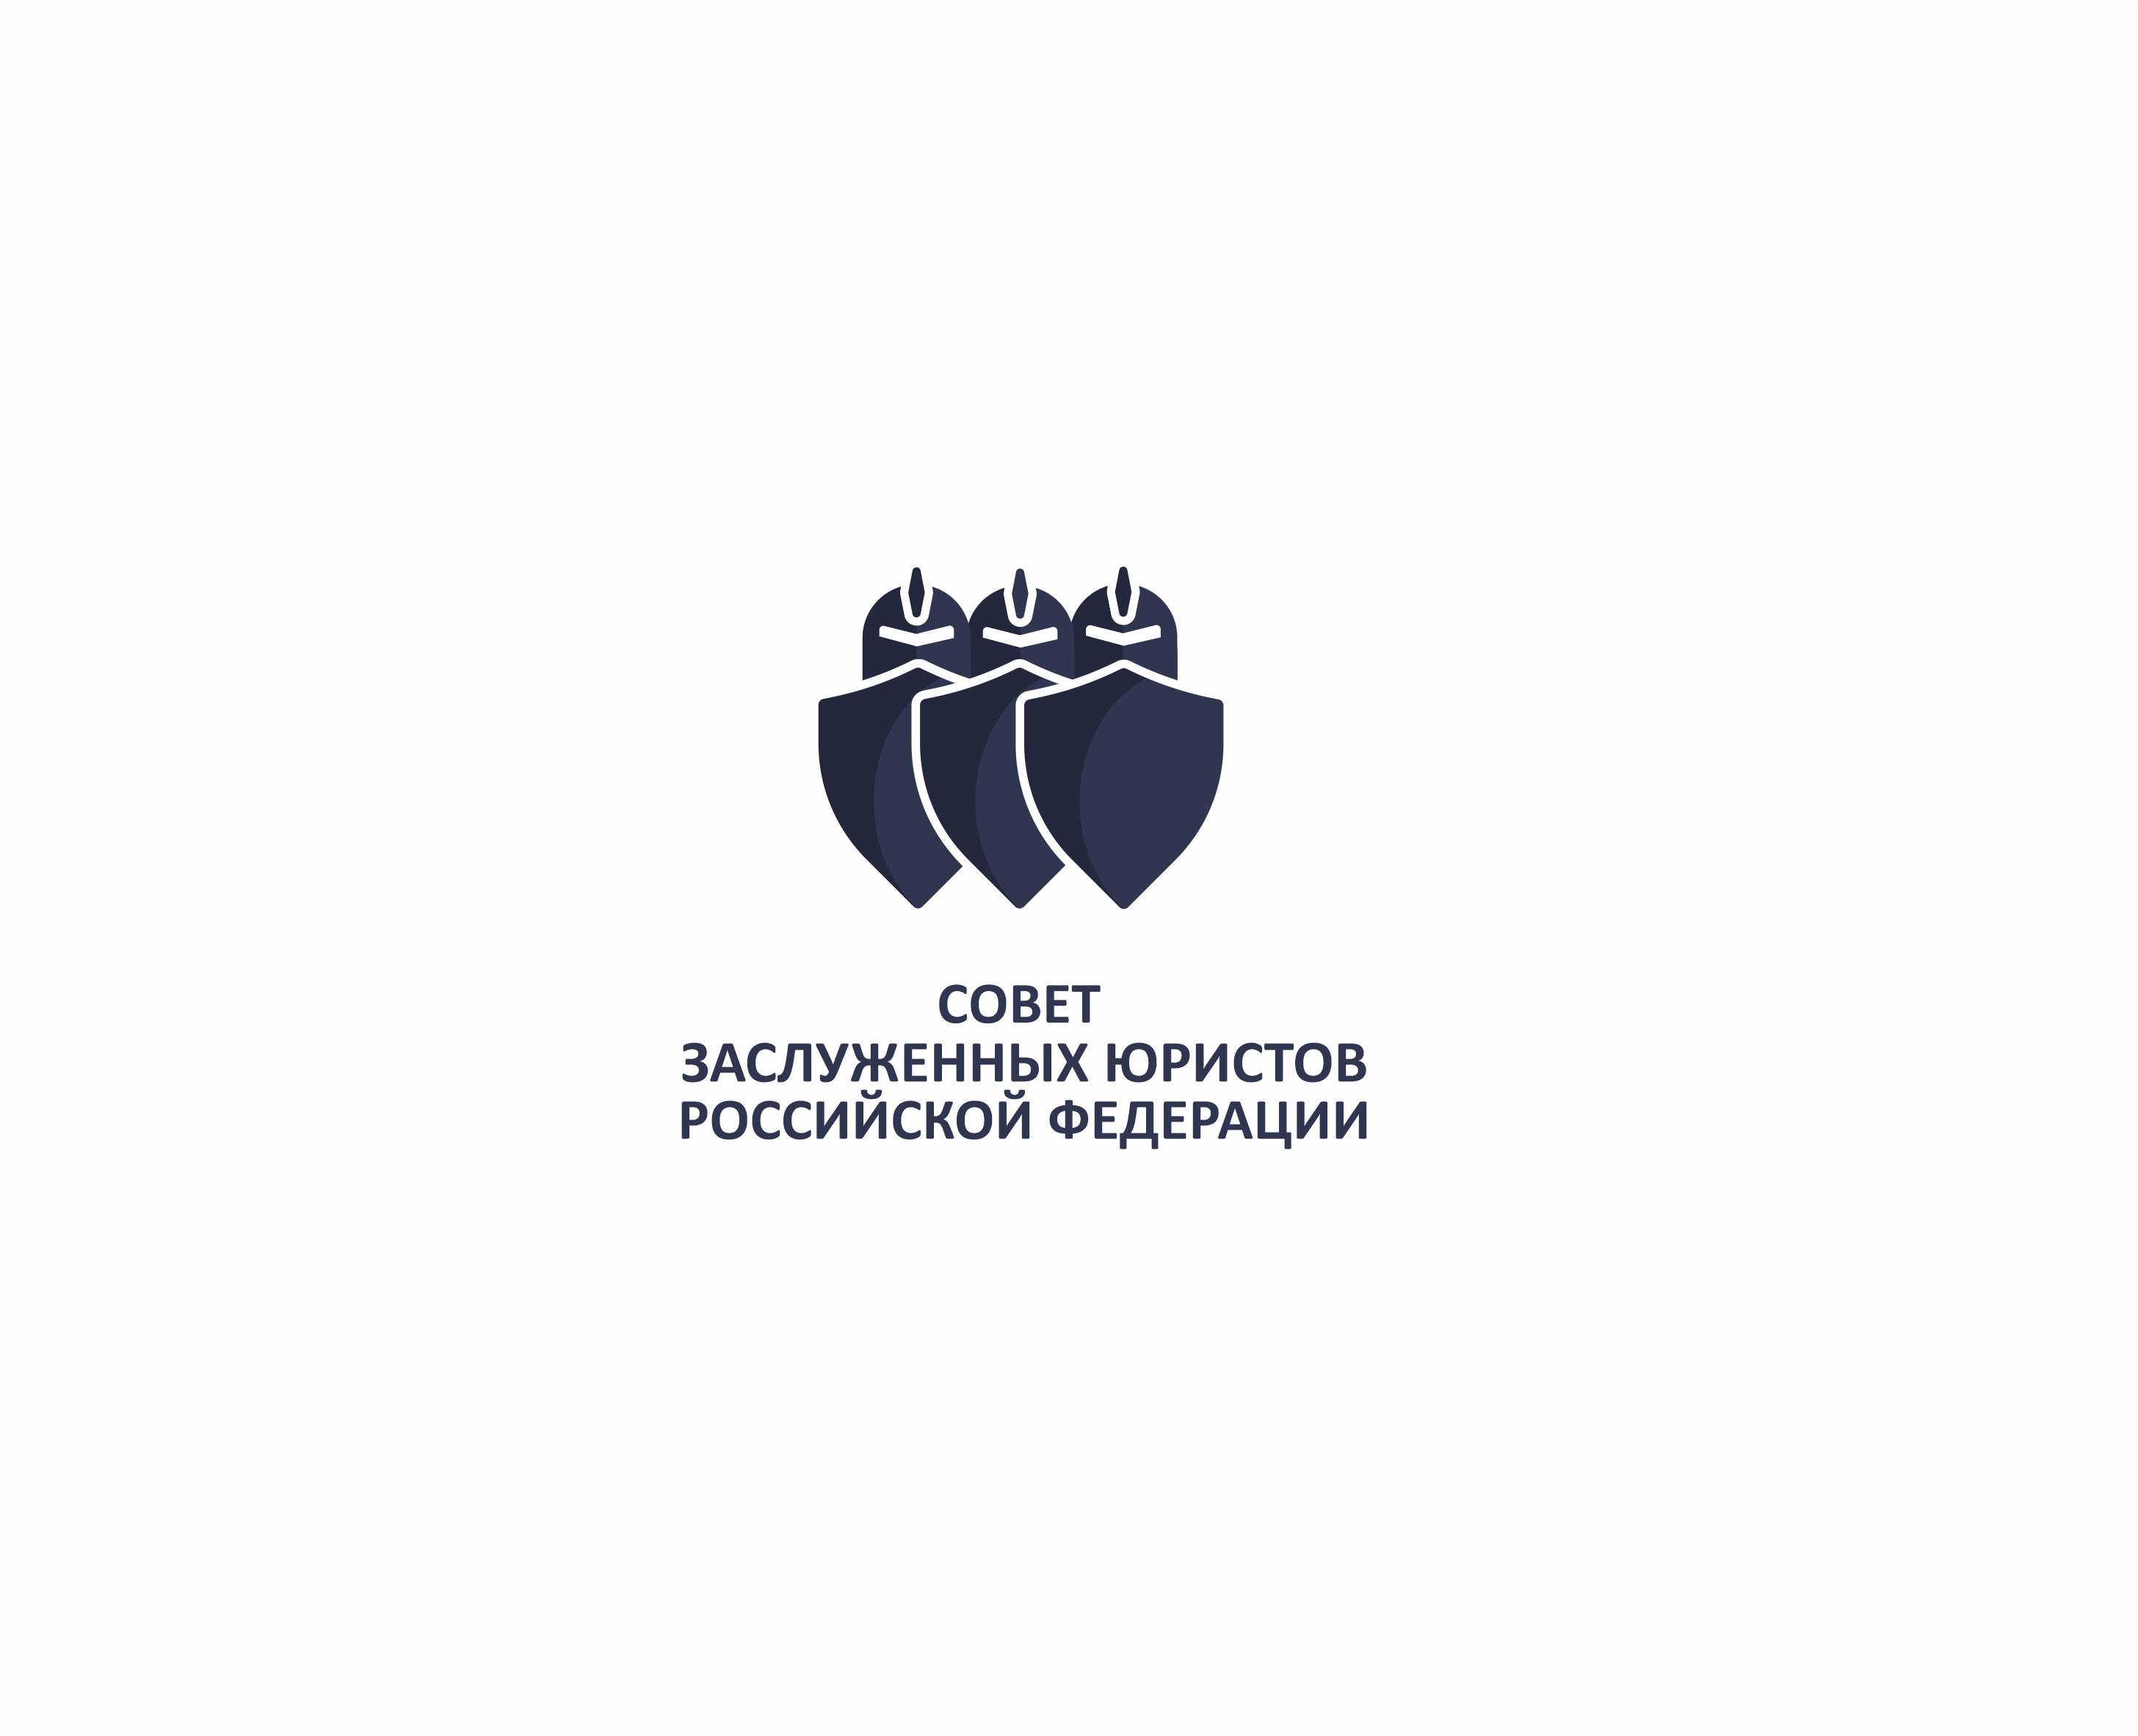 Разработка логотипа Совета (Клуба) заслуженных юристов Российской Федерации фото f_9755e411392e8b15.png